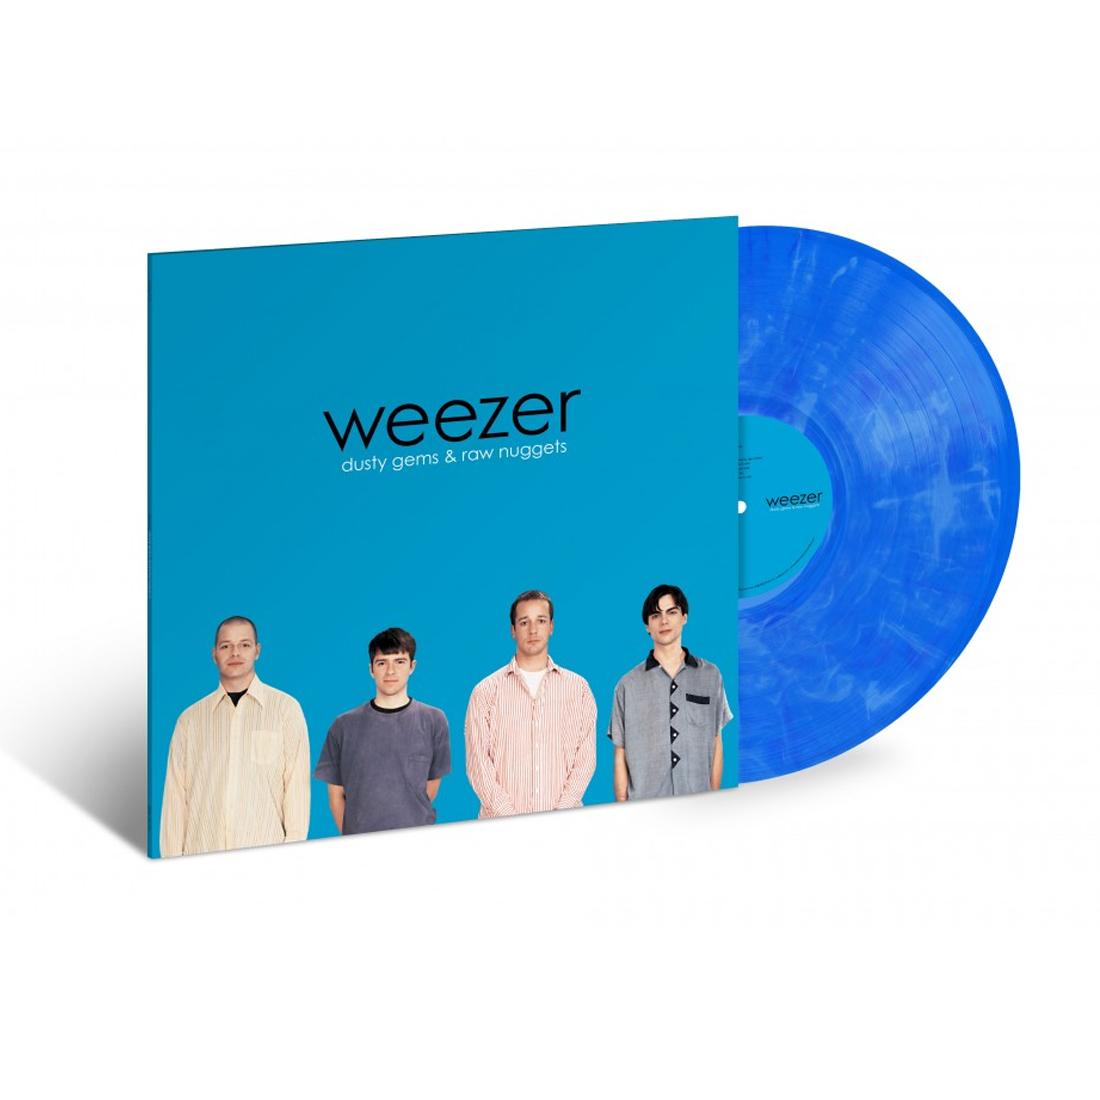 Weezer Christmas Sweater.The Sound Of Vinyl